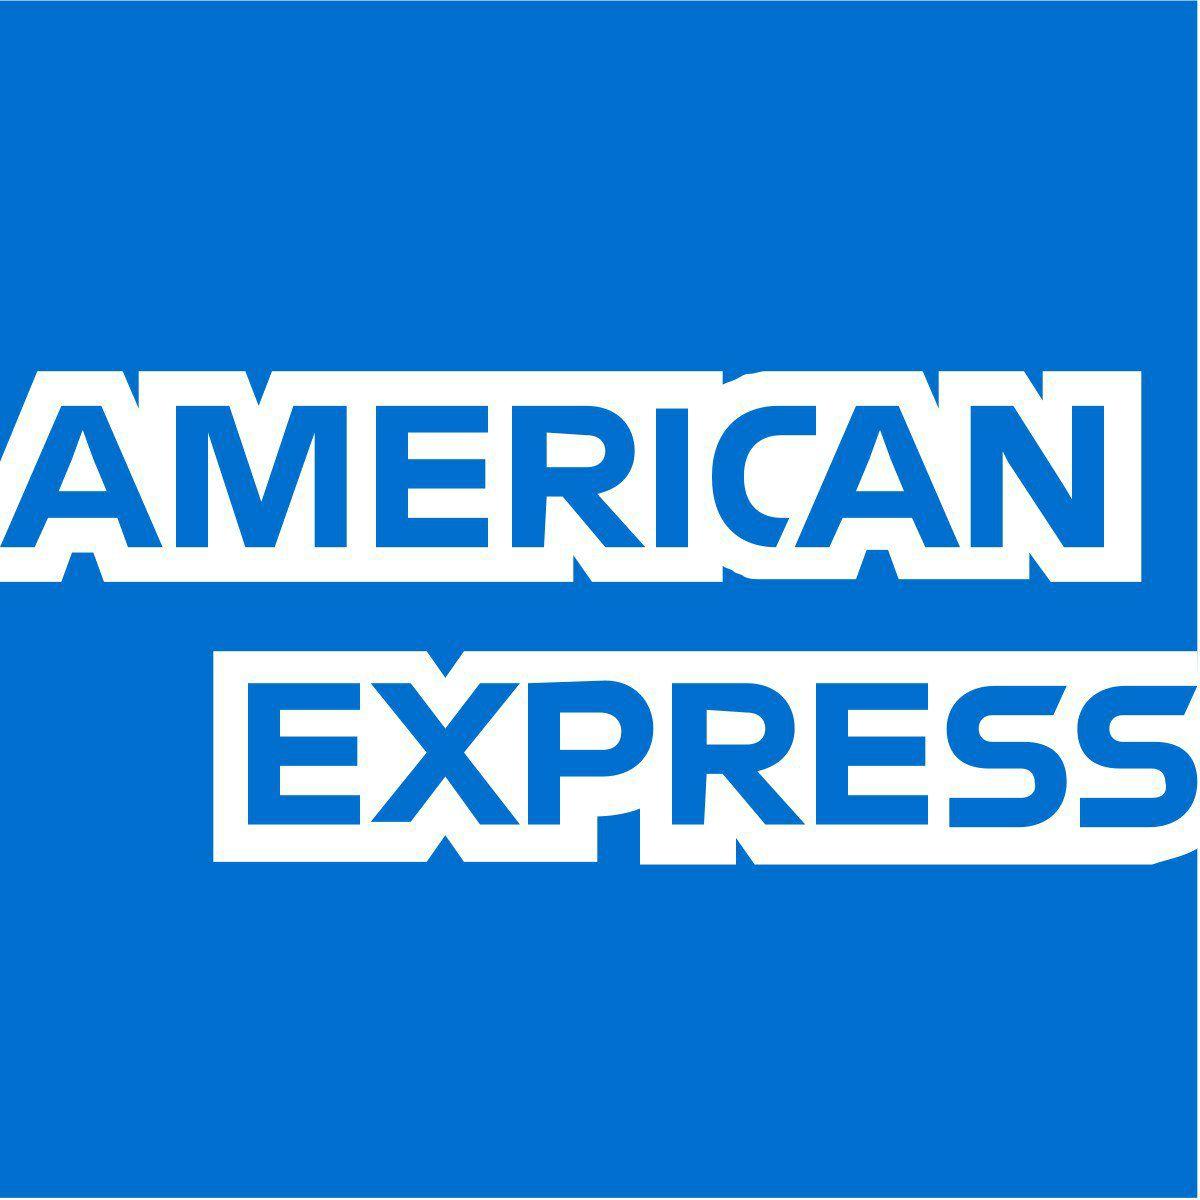 30€ gratis al comprar +200€ en carrefour.es (American Express)